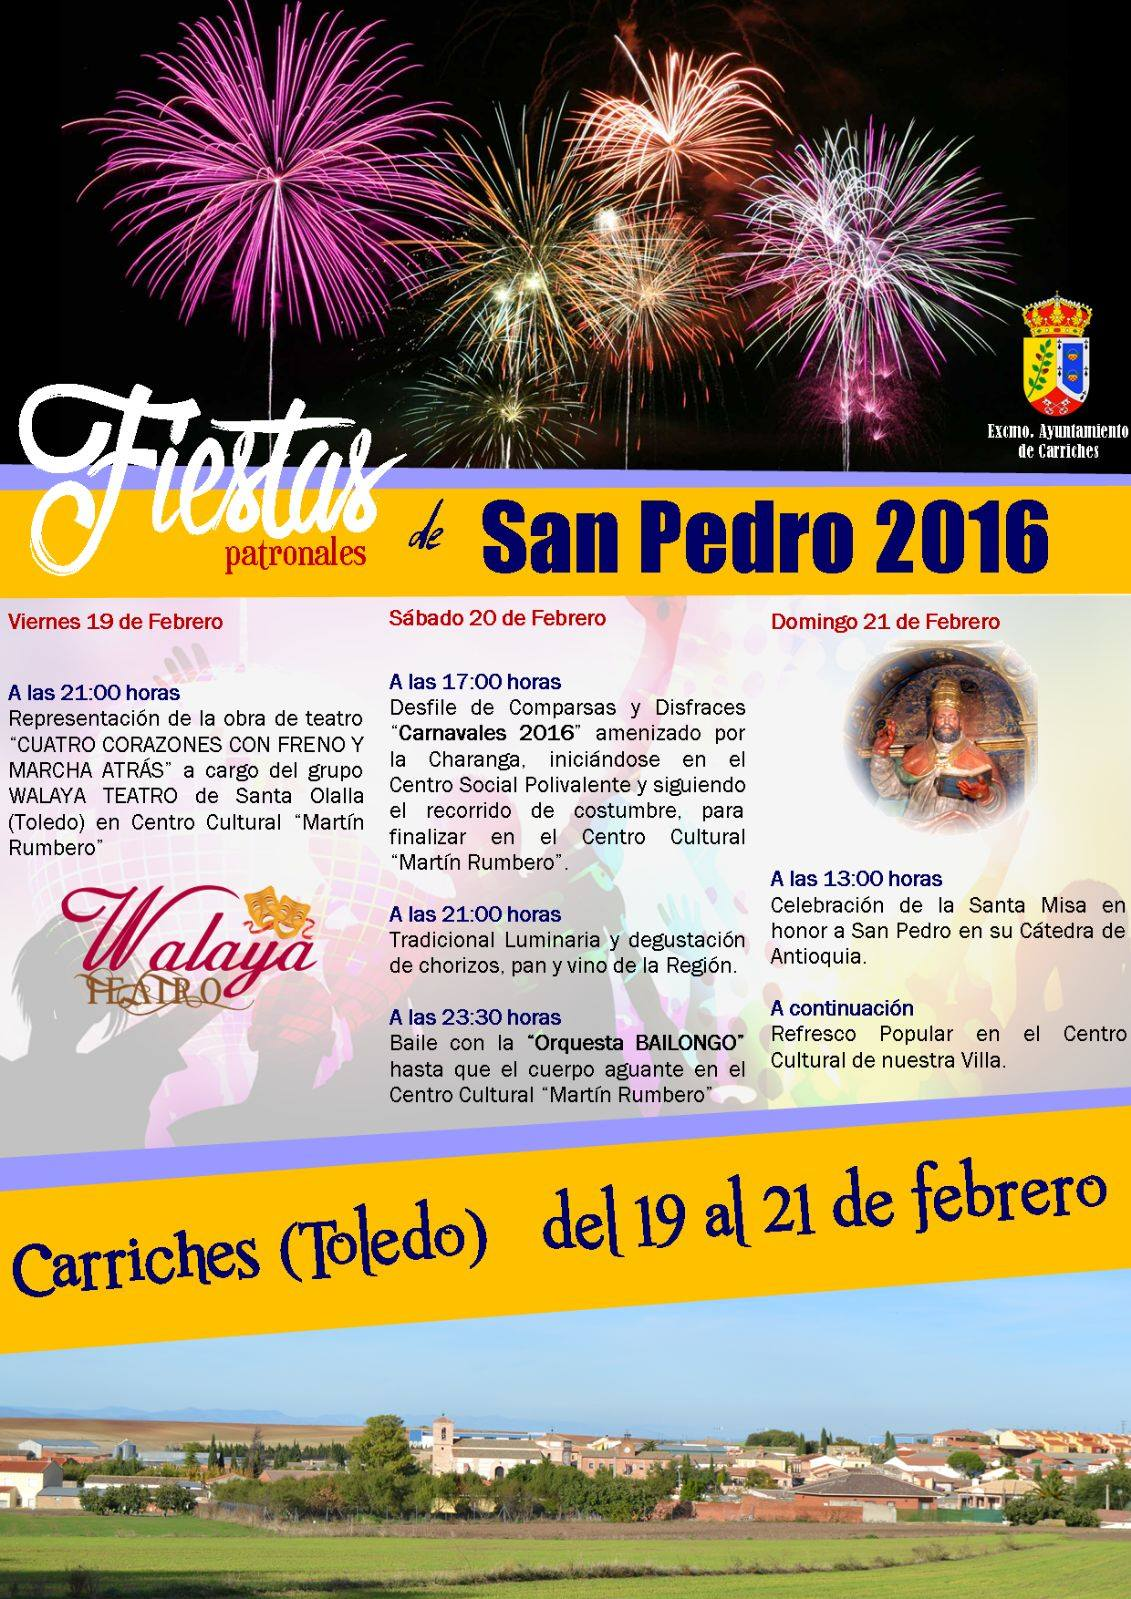 Fiestas de carriches en honor de la c tedra de san pedro for Fiestas jardin antioquia 2016